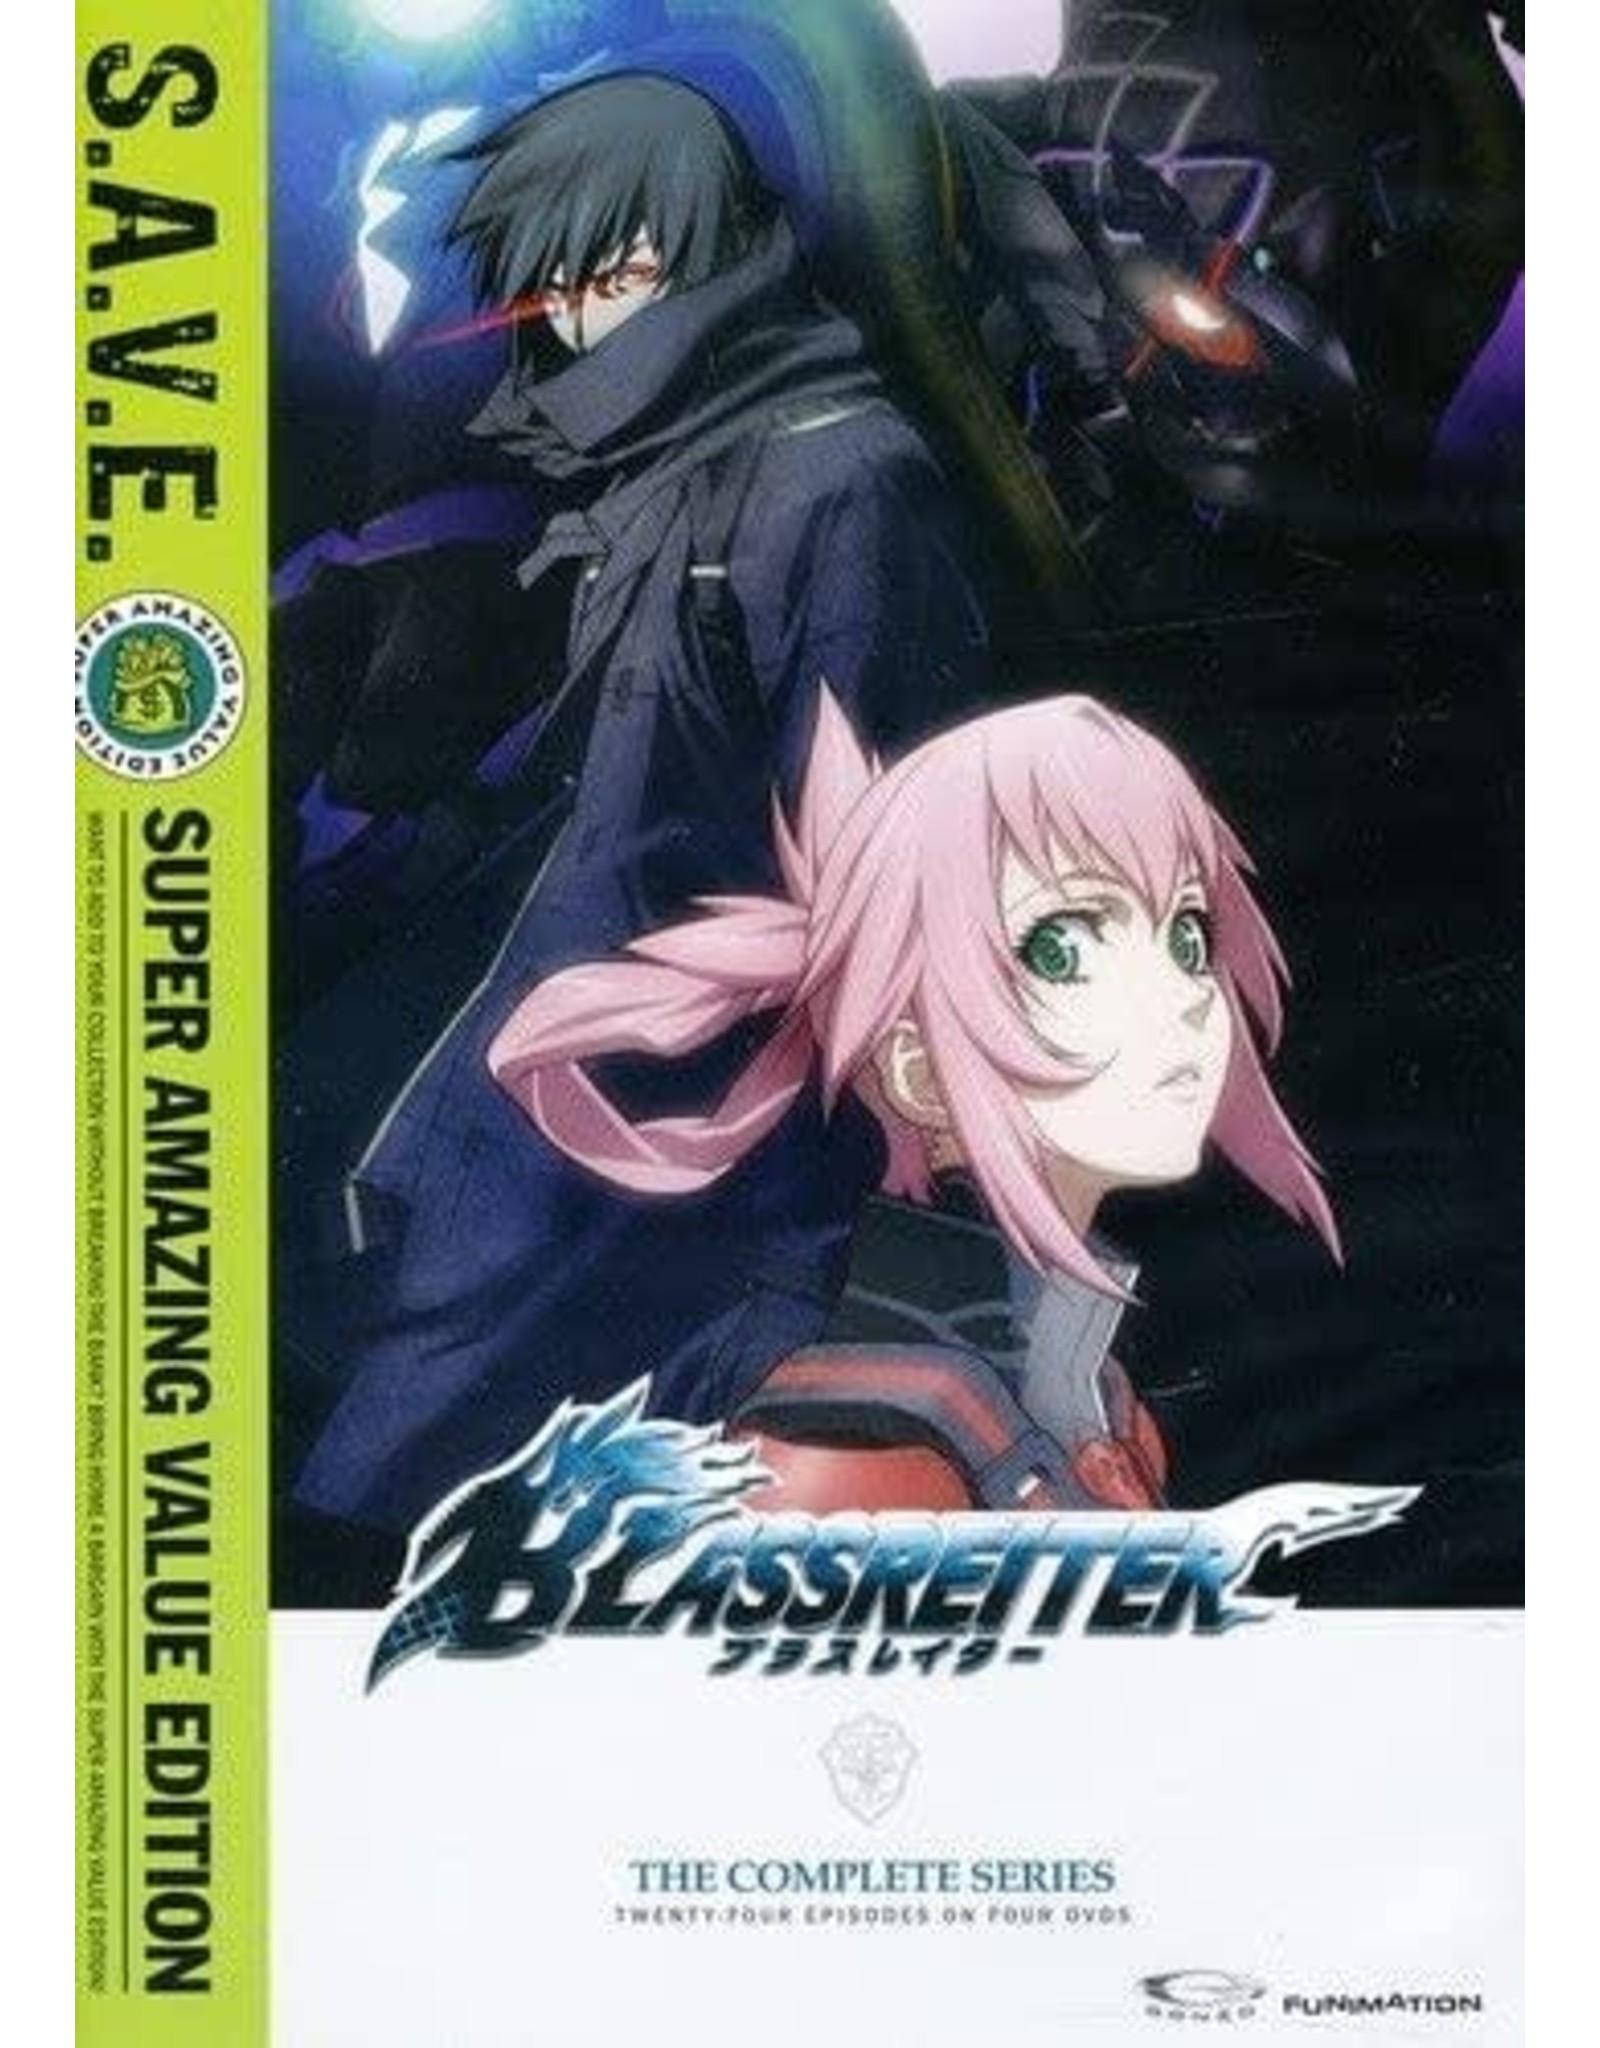 Anime Blassreiter Complete Series